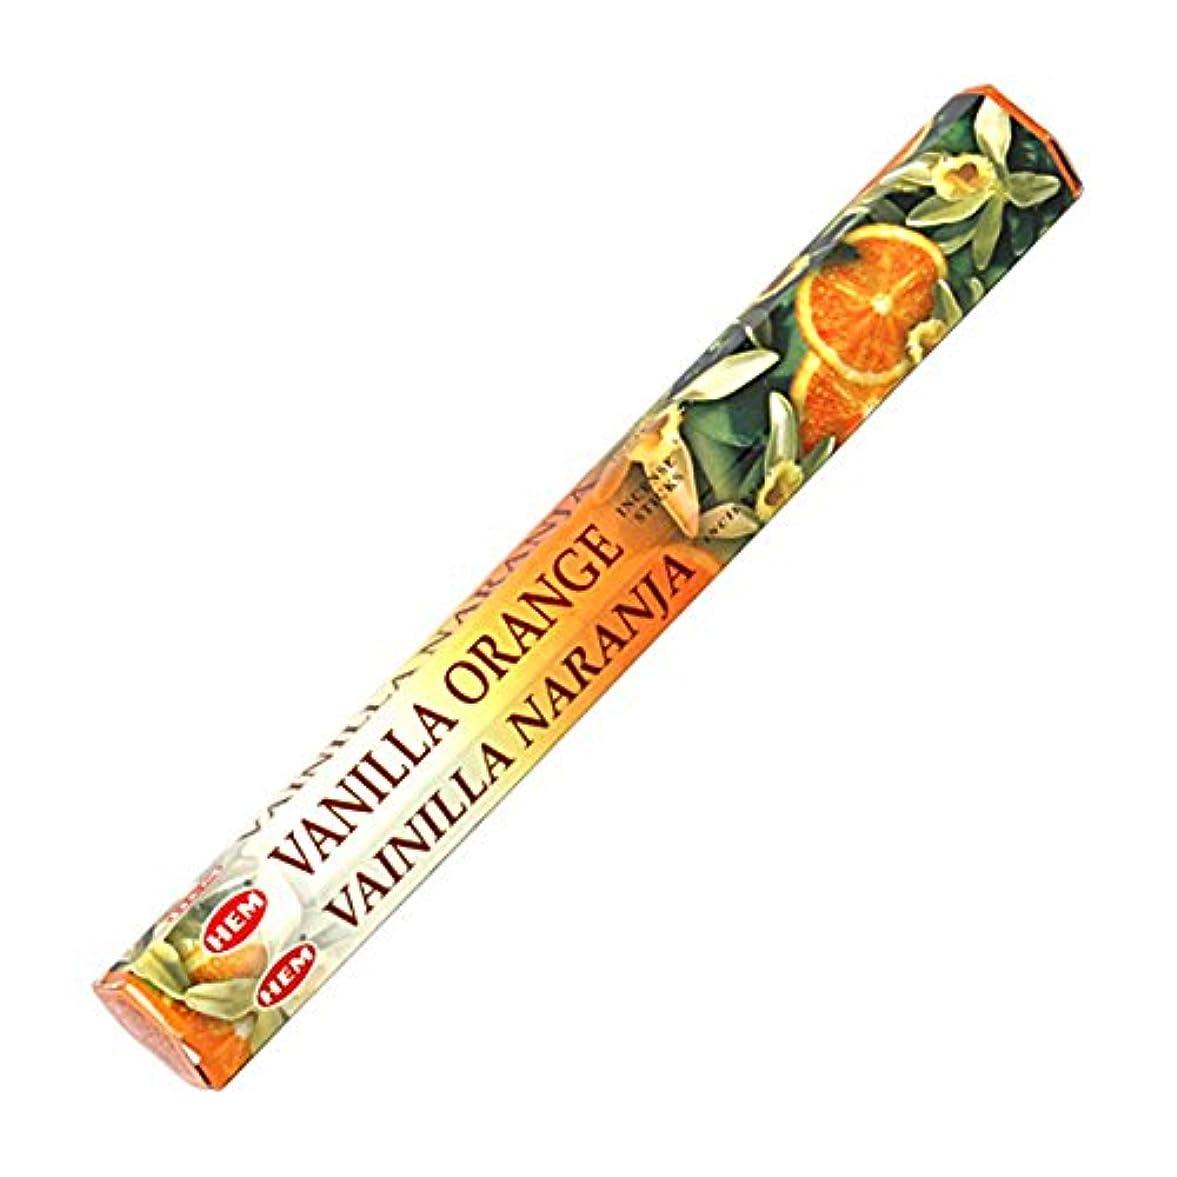 HEM(ヘム) バニラオレンジ VANILLA ORANGE スティックタイプ お香 1筒 単品 [並行輸入品]